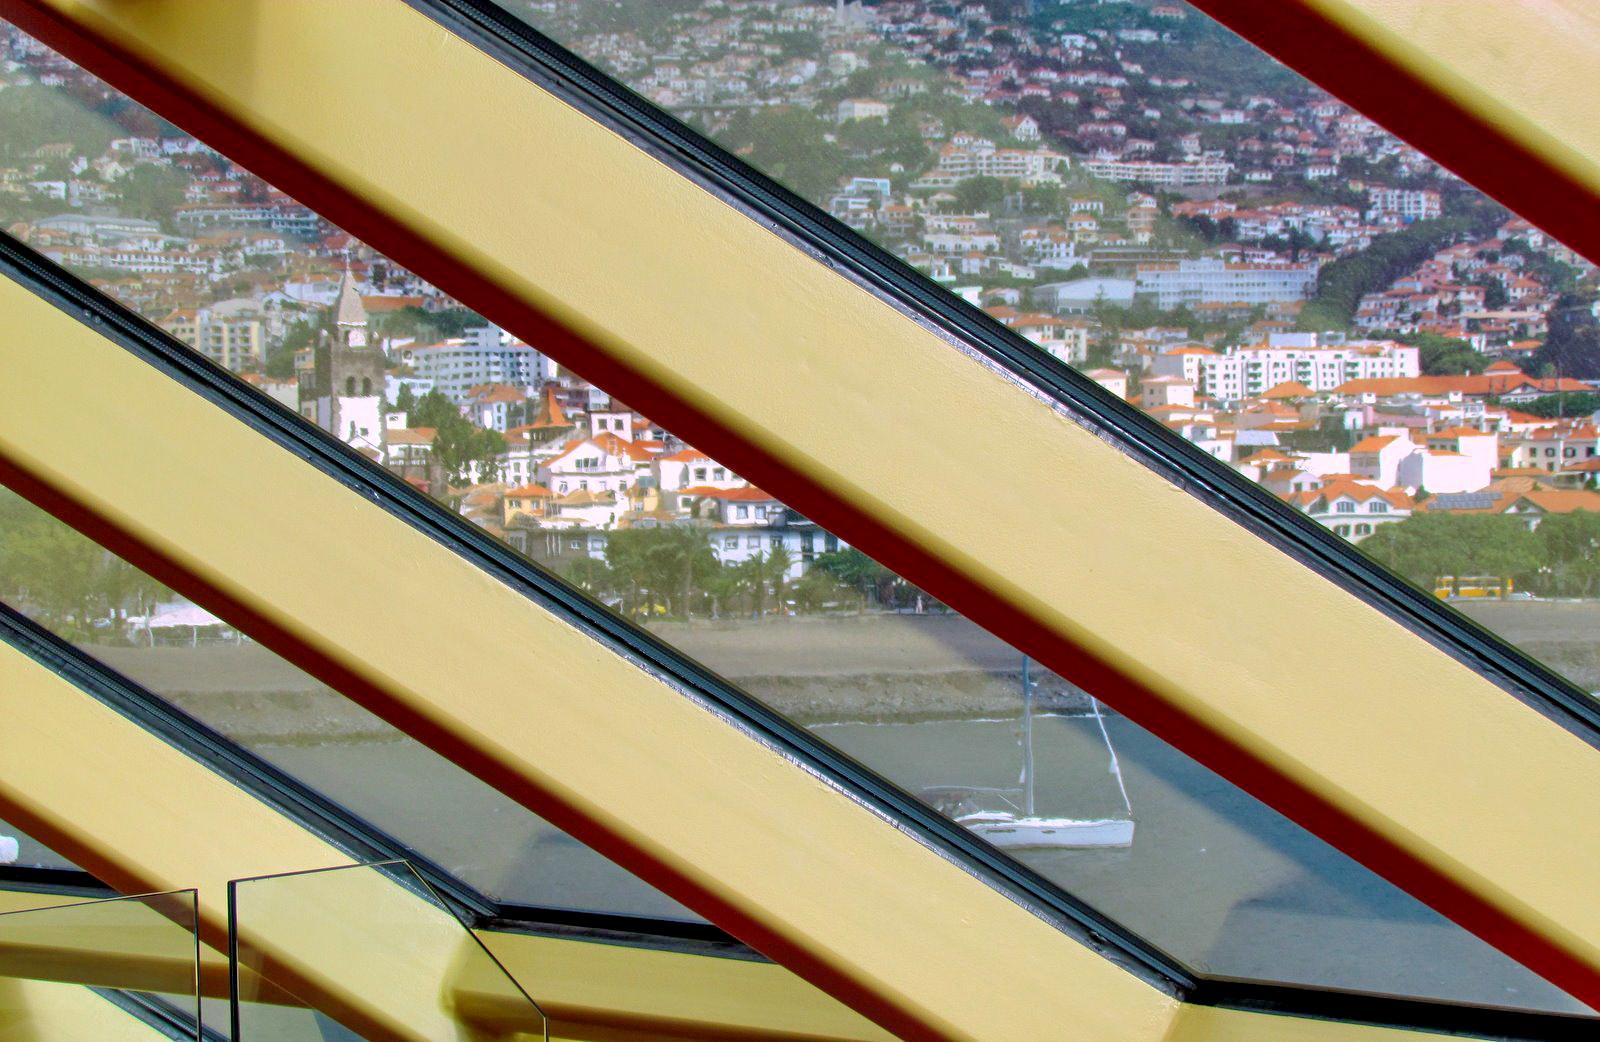 AIDAsol begin today weekly cruises to Funchal